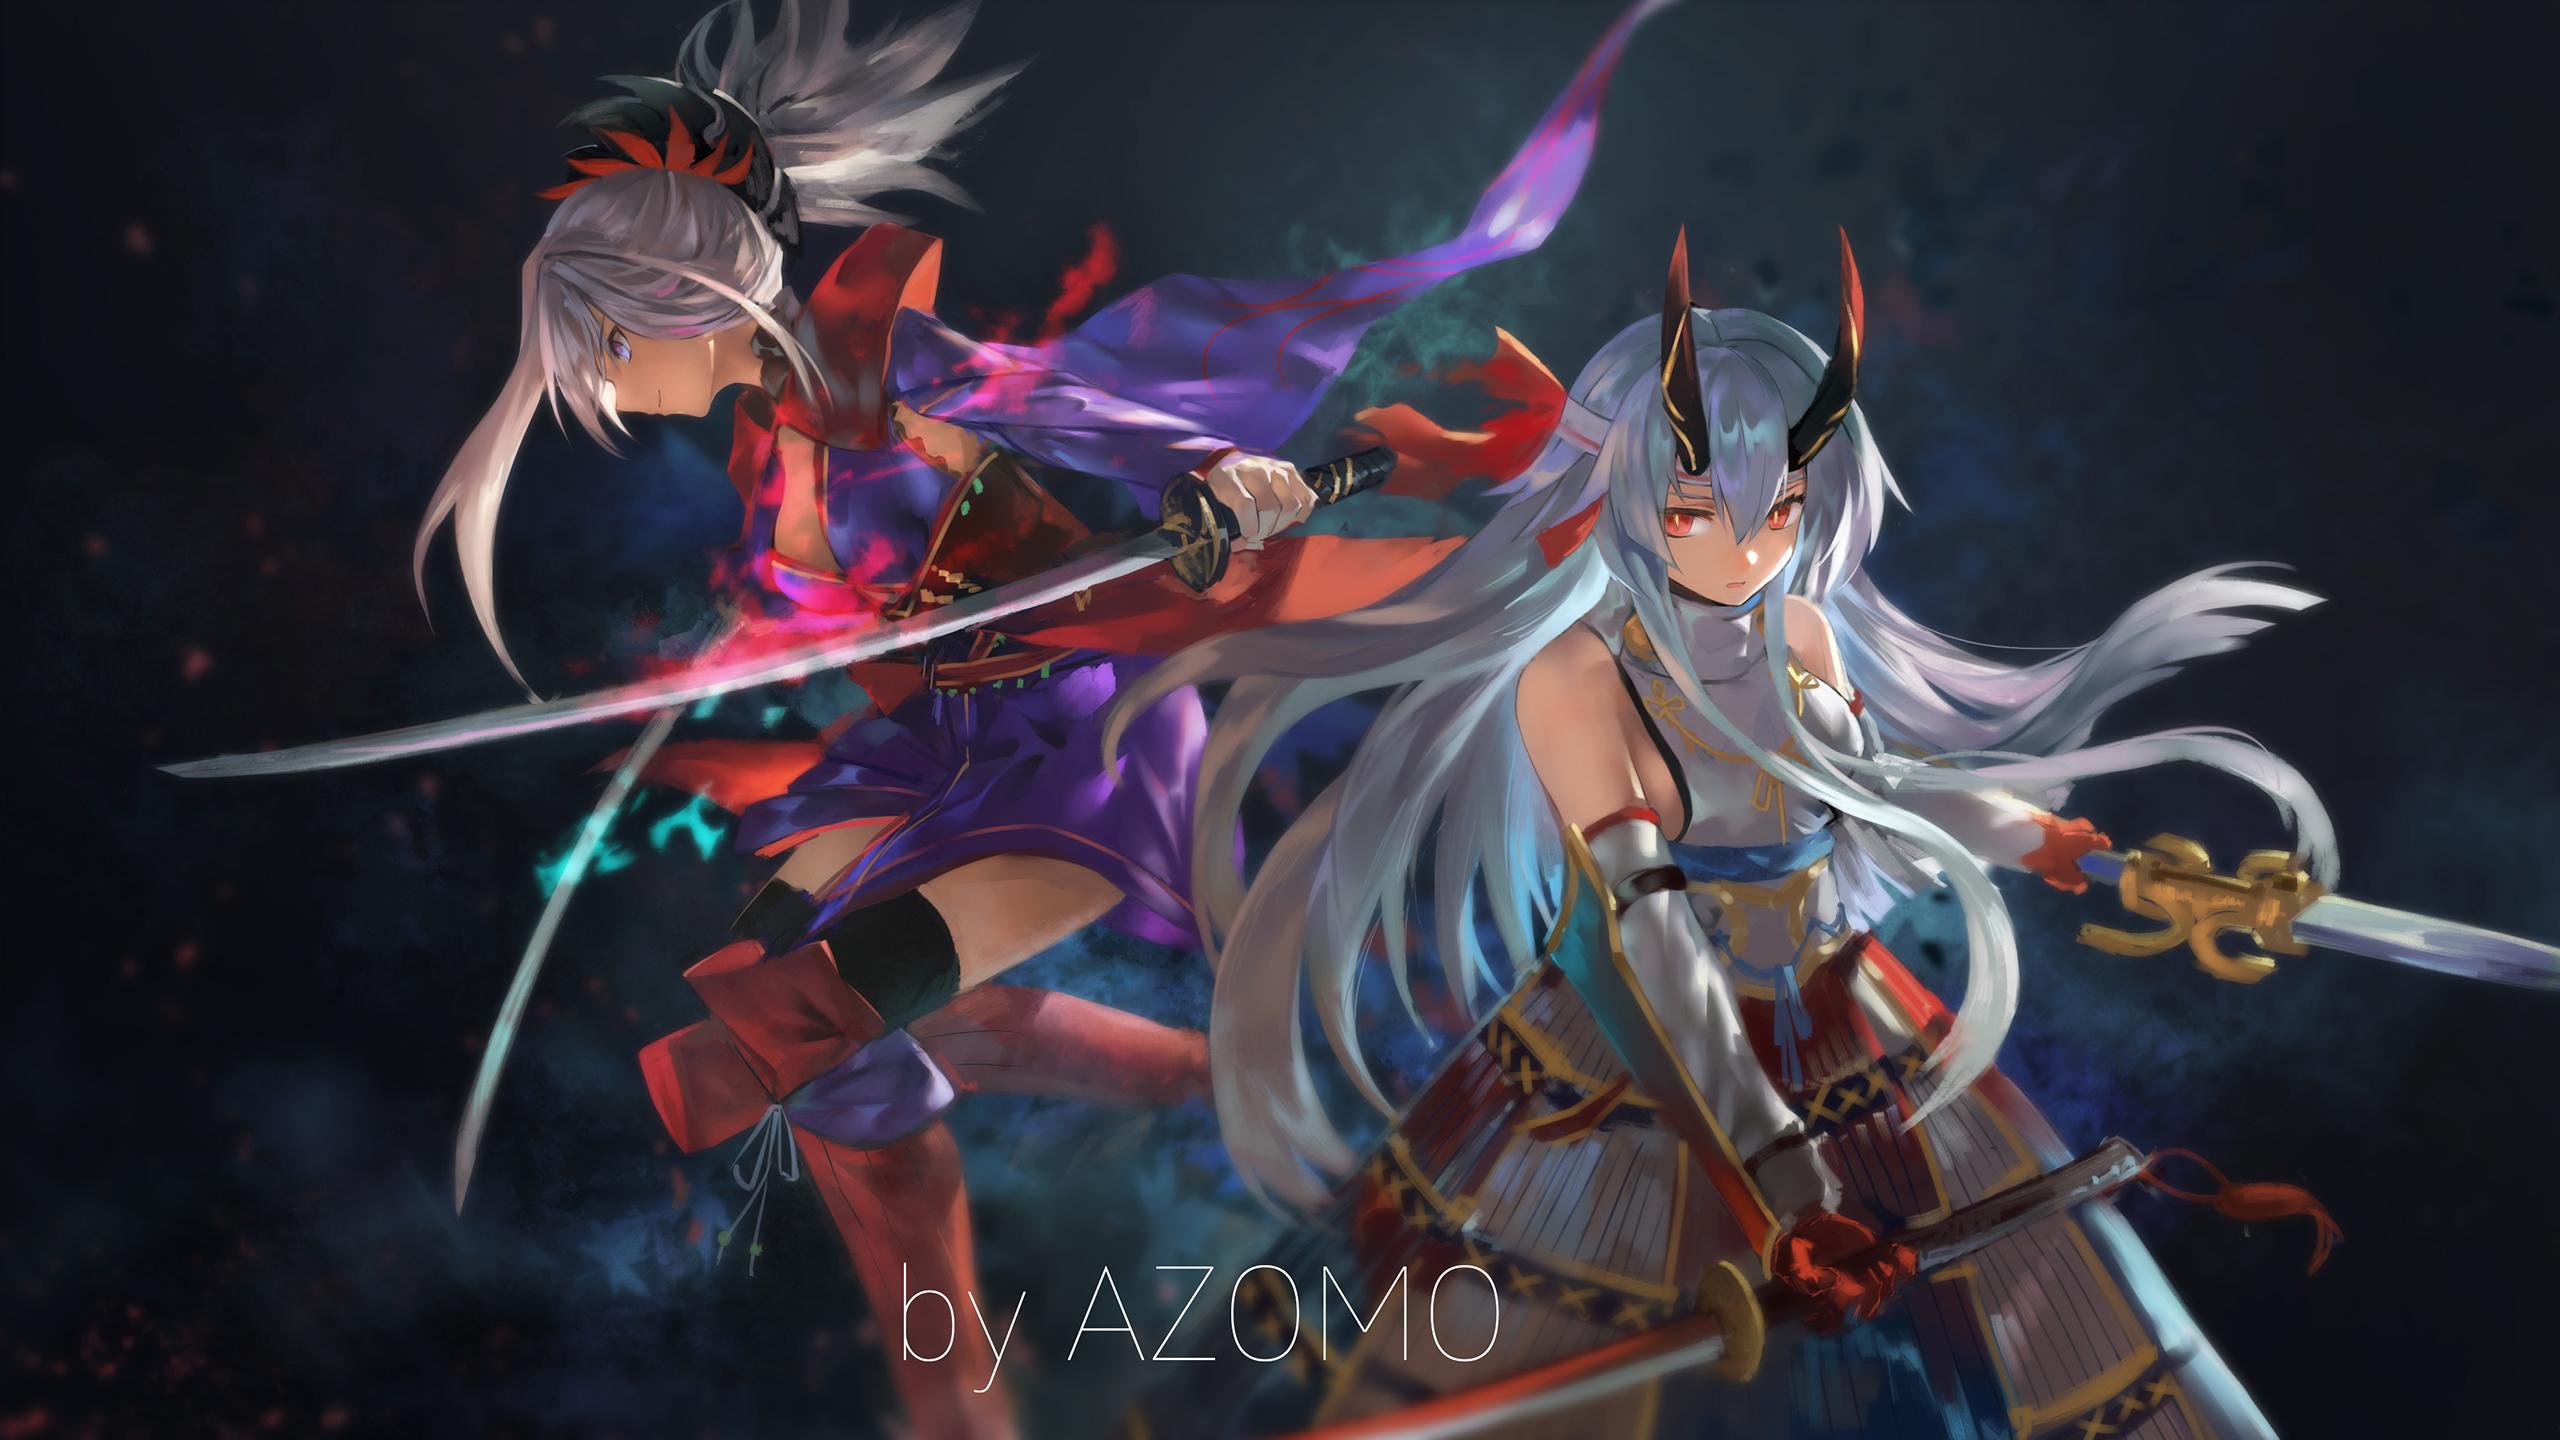 65512489_p0.png 2,560×1,440ピクセル Anime, Musashi, Miyamoto